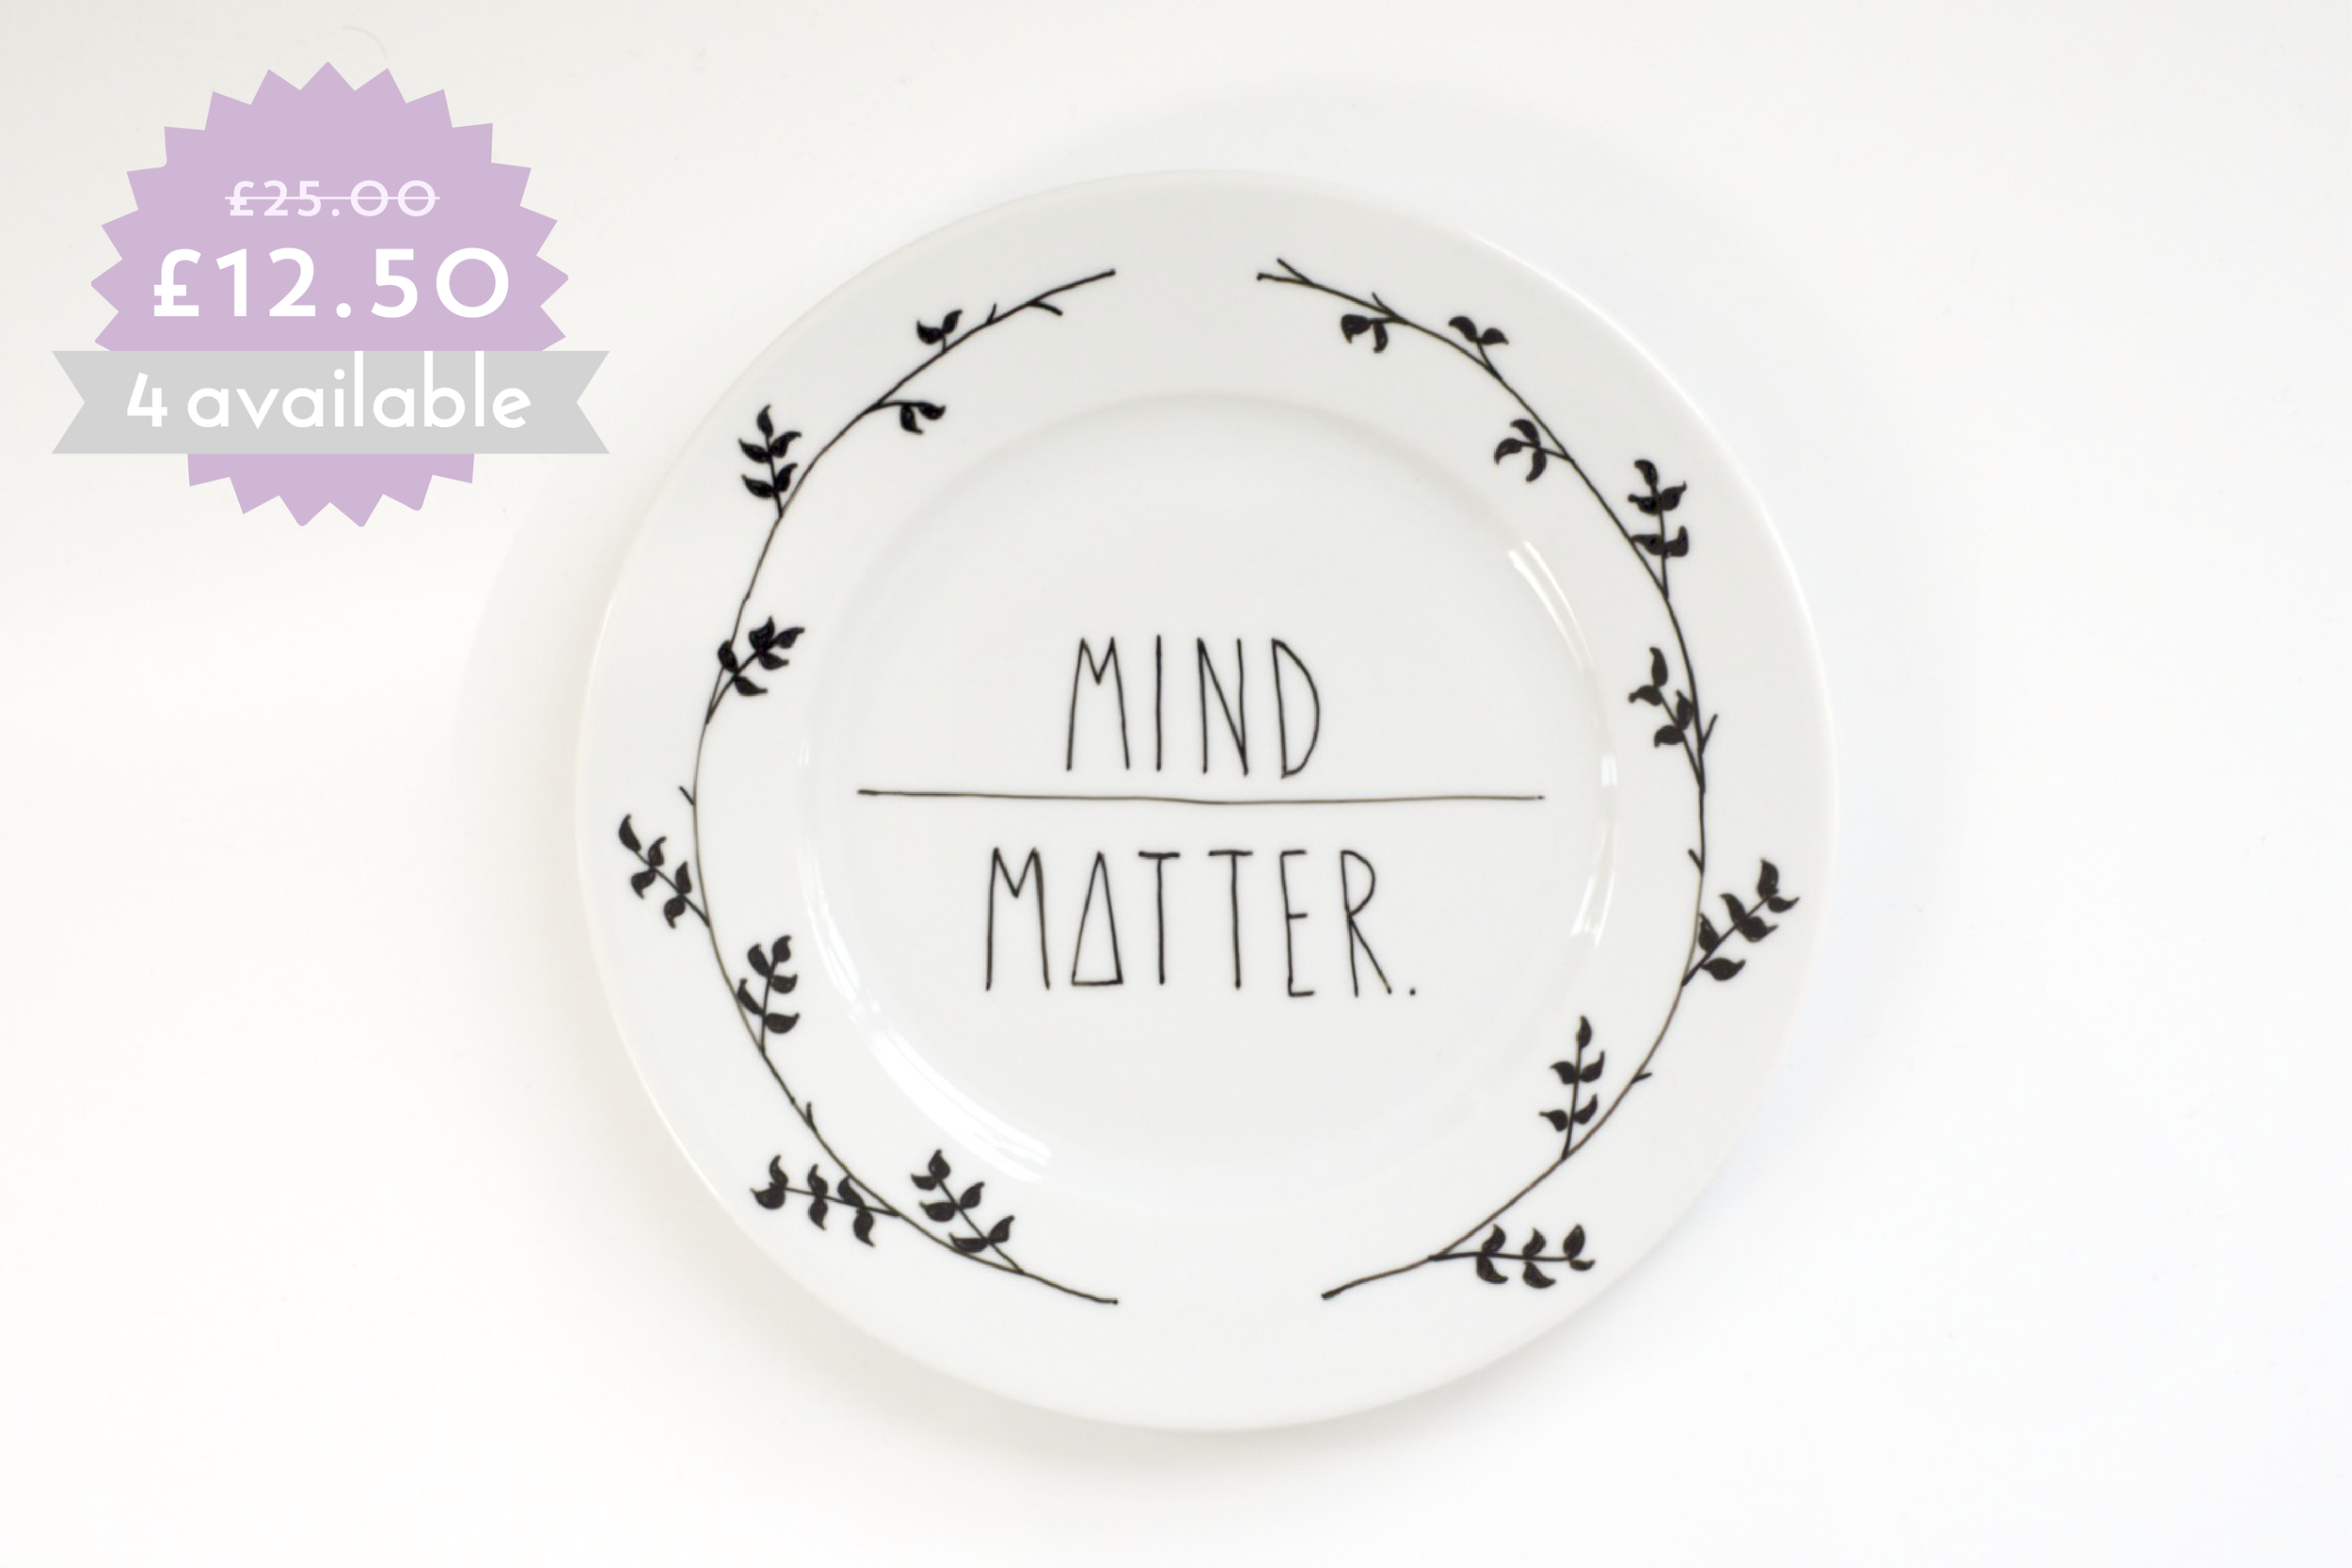 mind matter-01.png